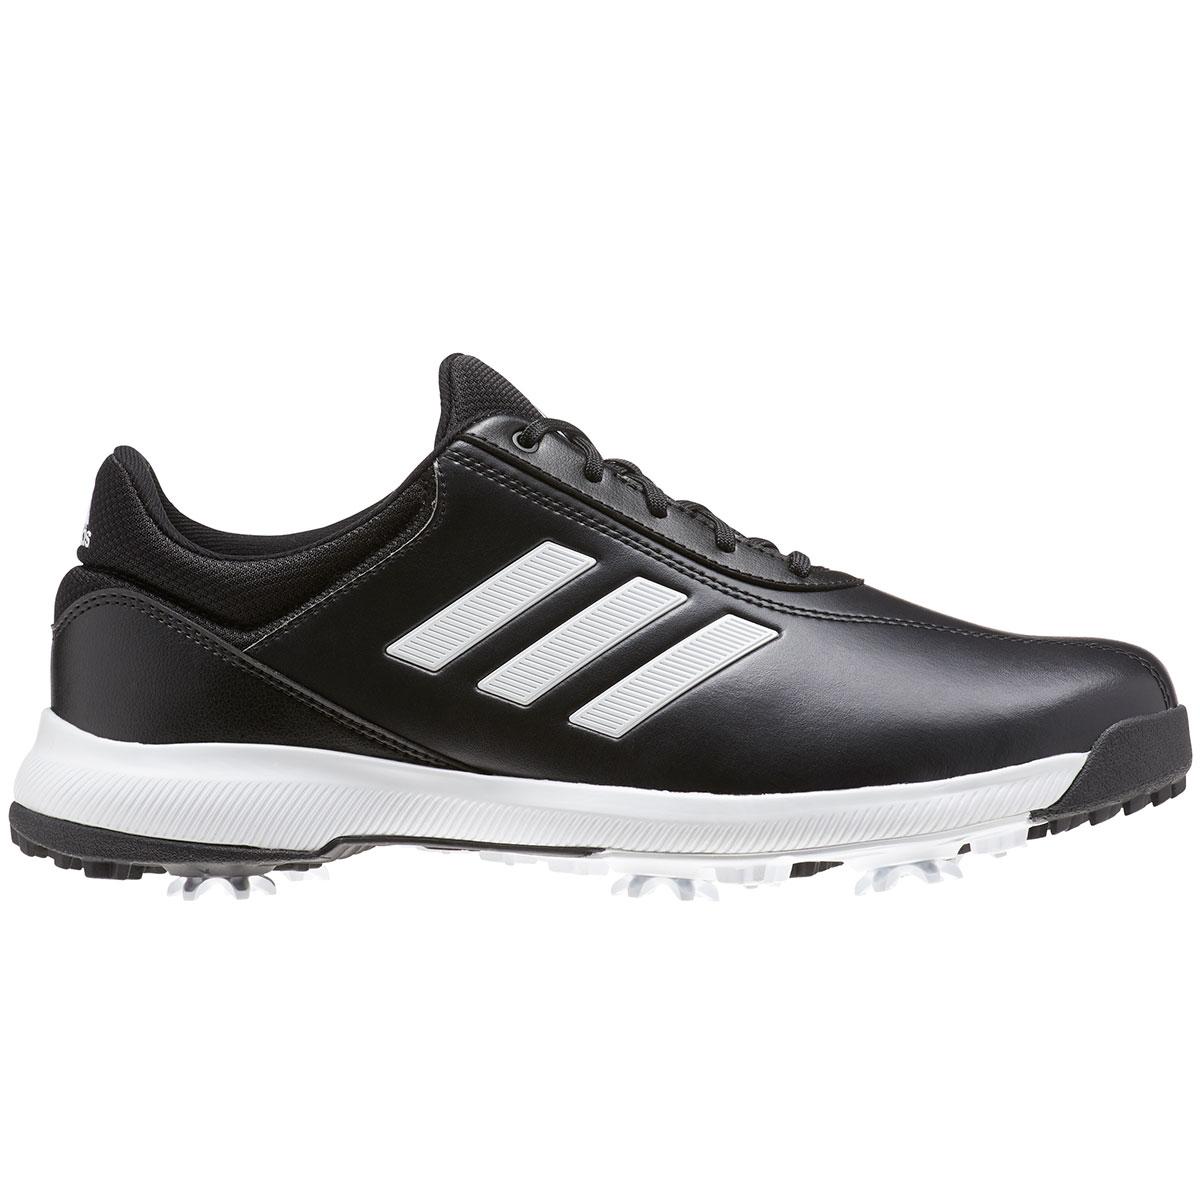 adidas traxion golf shoes